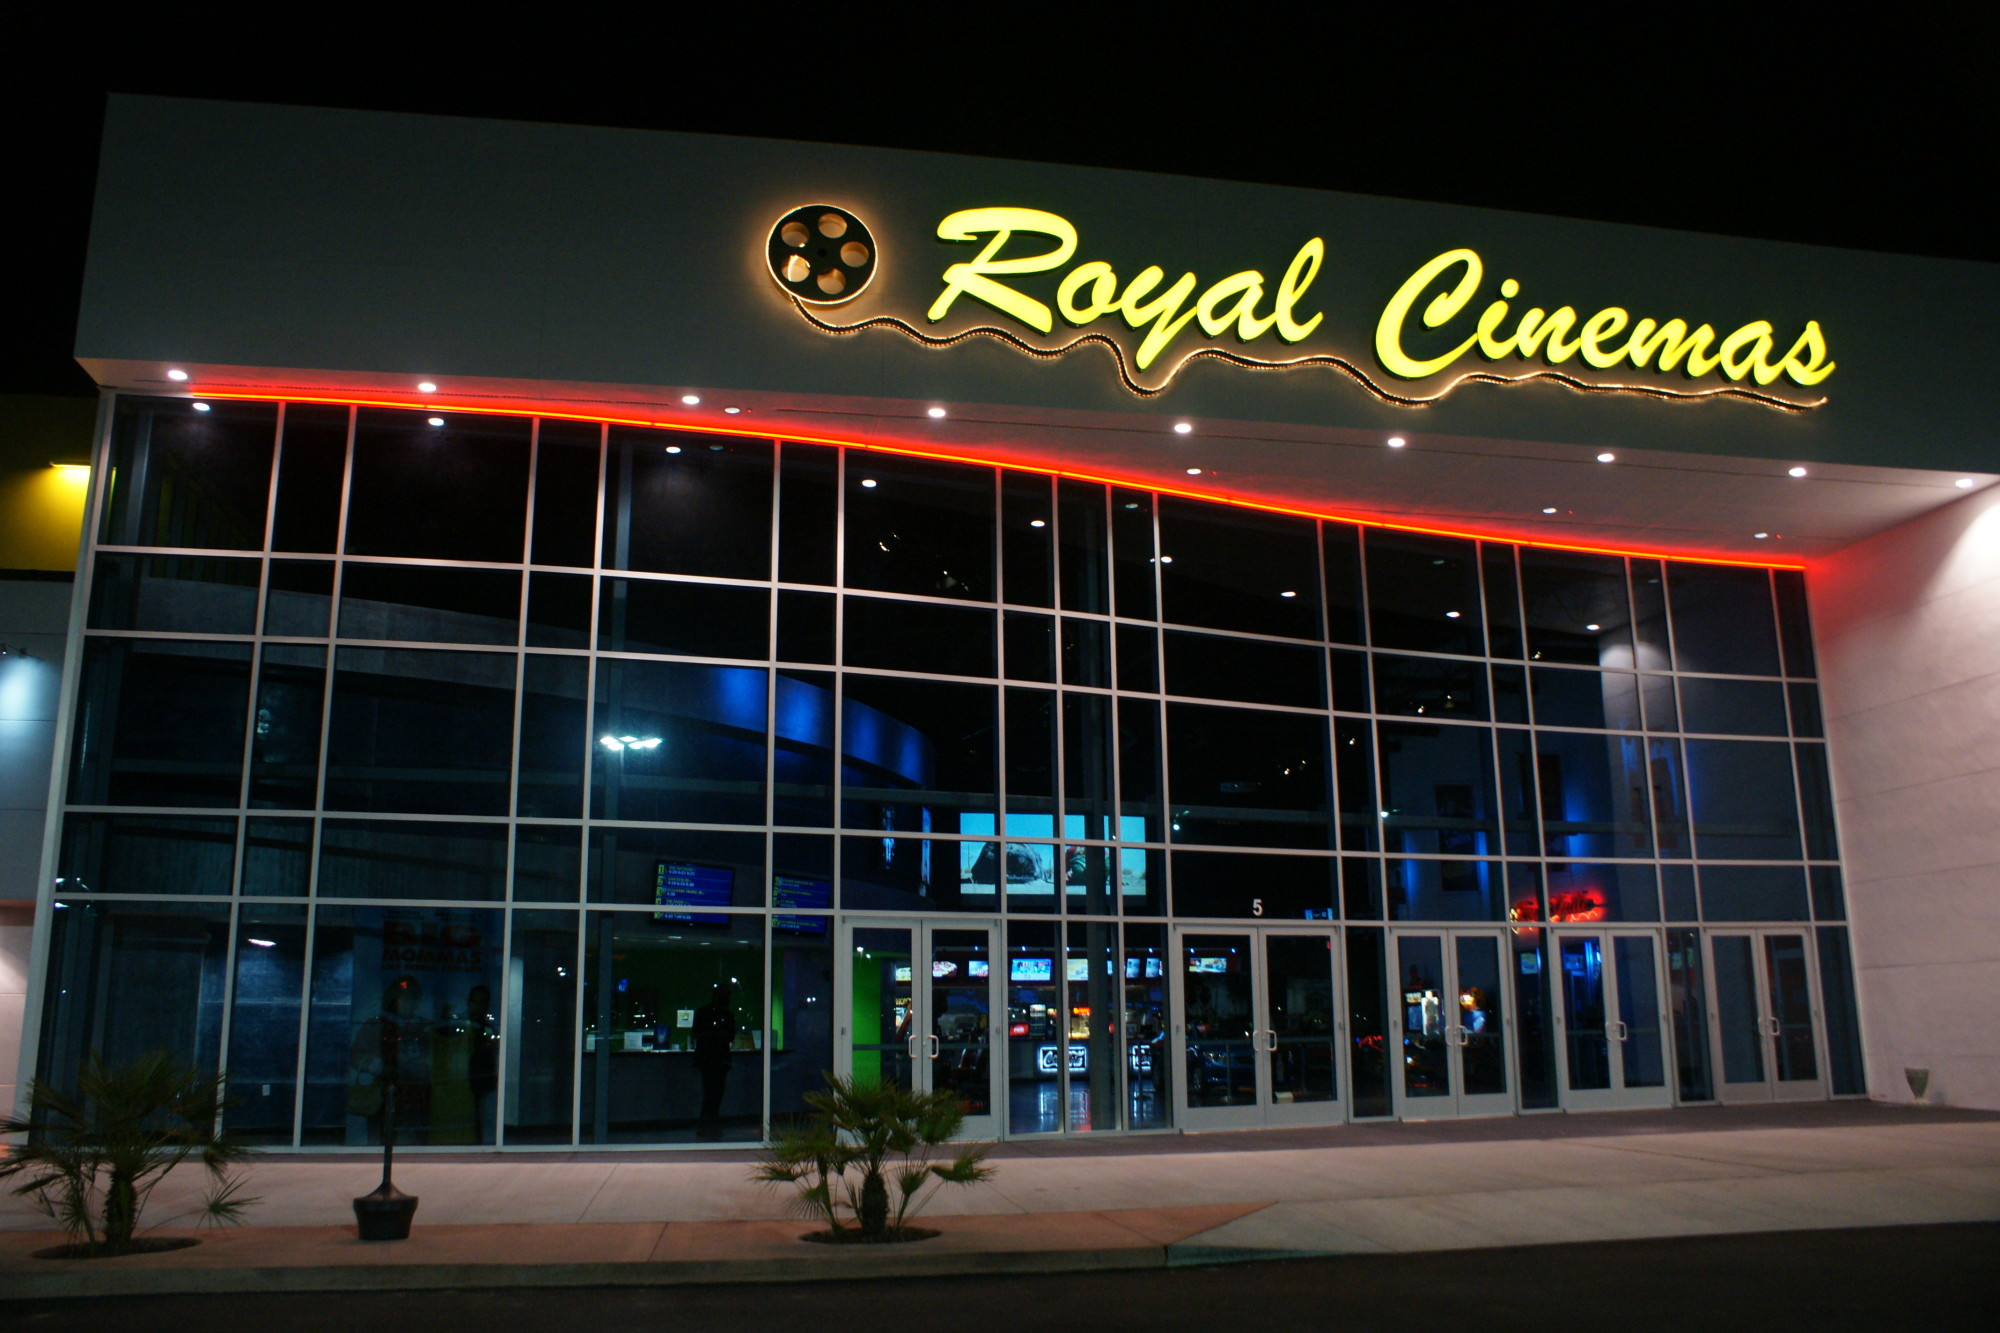 Royal Cinemas Amp Imax Official Georgia Tourism Amp Travel